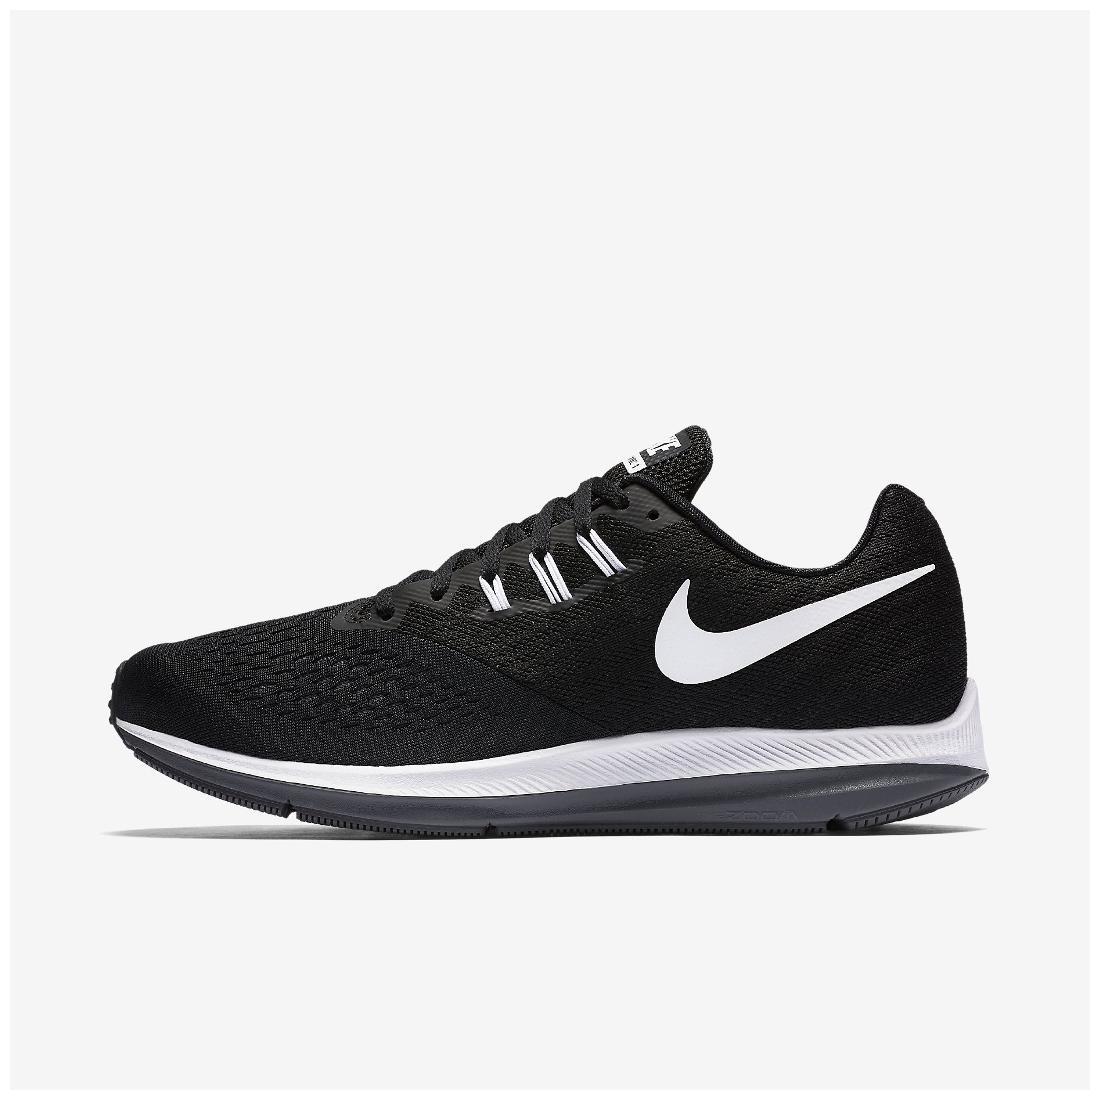 71cb1a62fb7 Nike Men s Zoom Winflo 4 Black Running Shoes